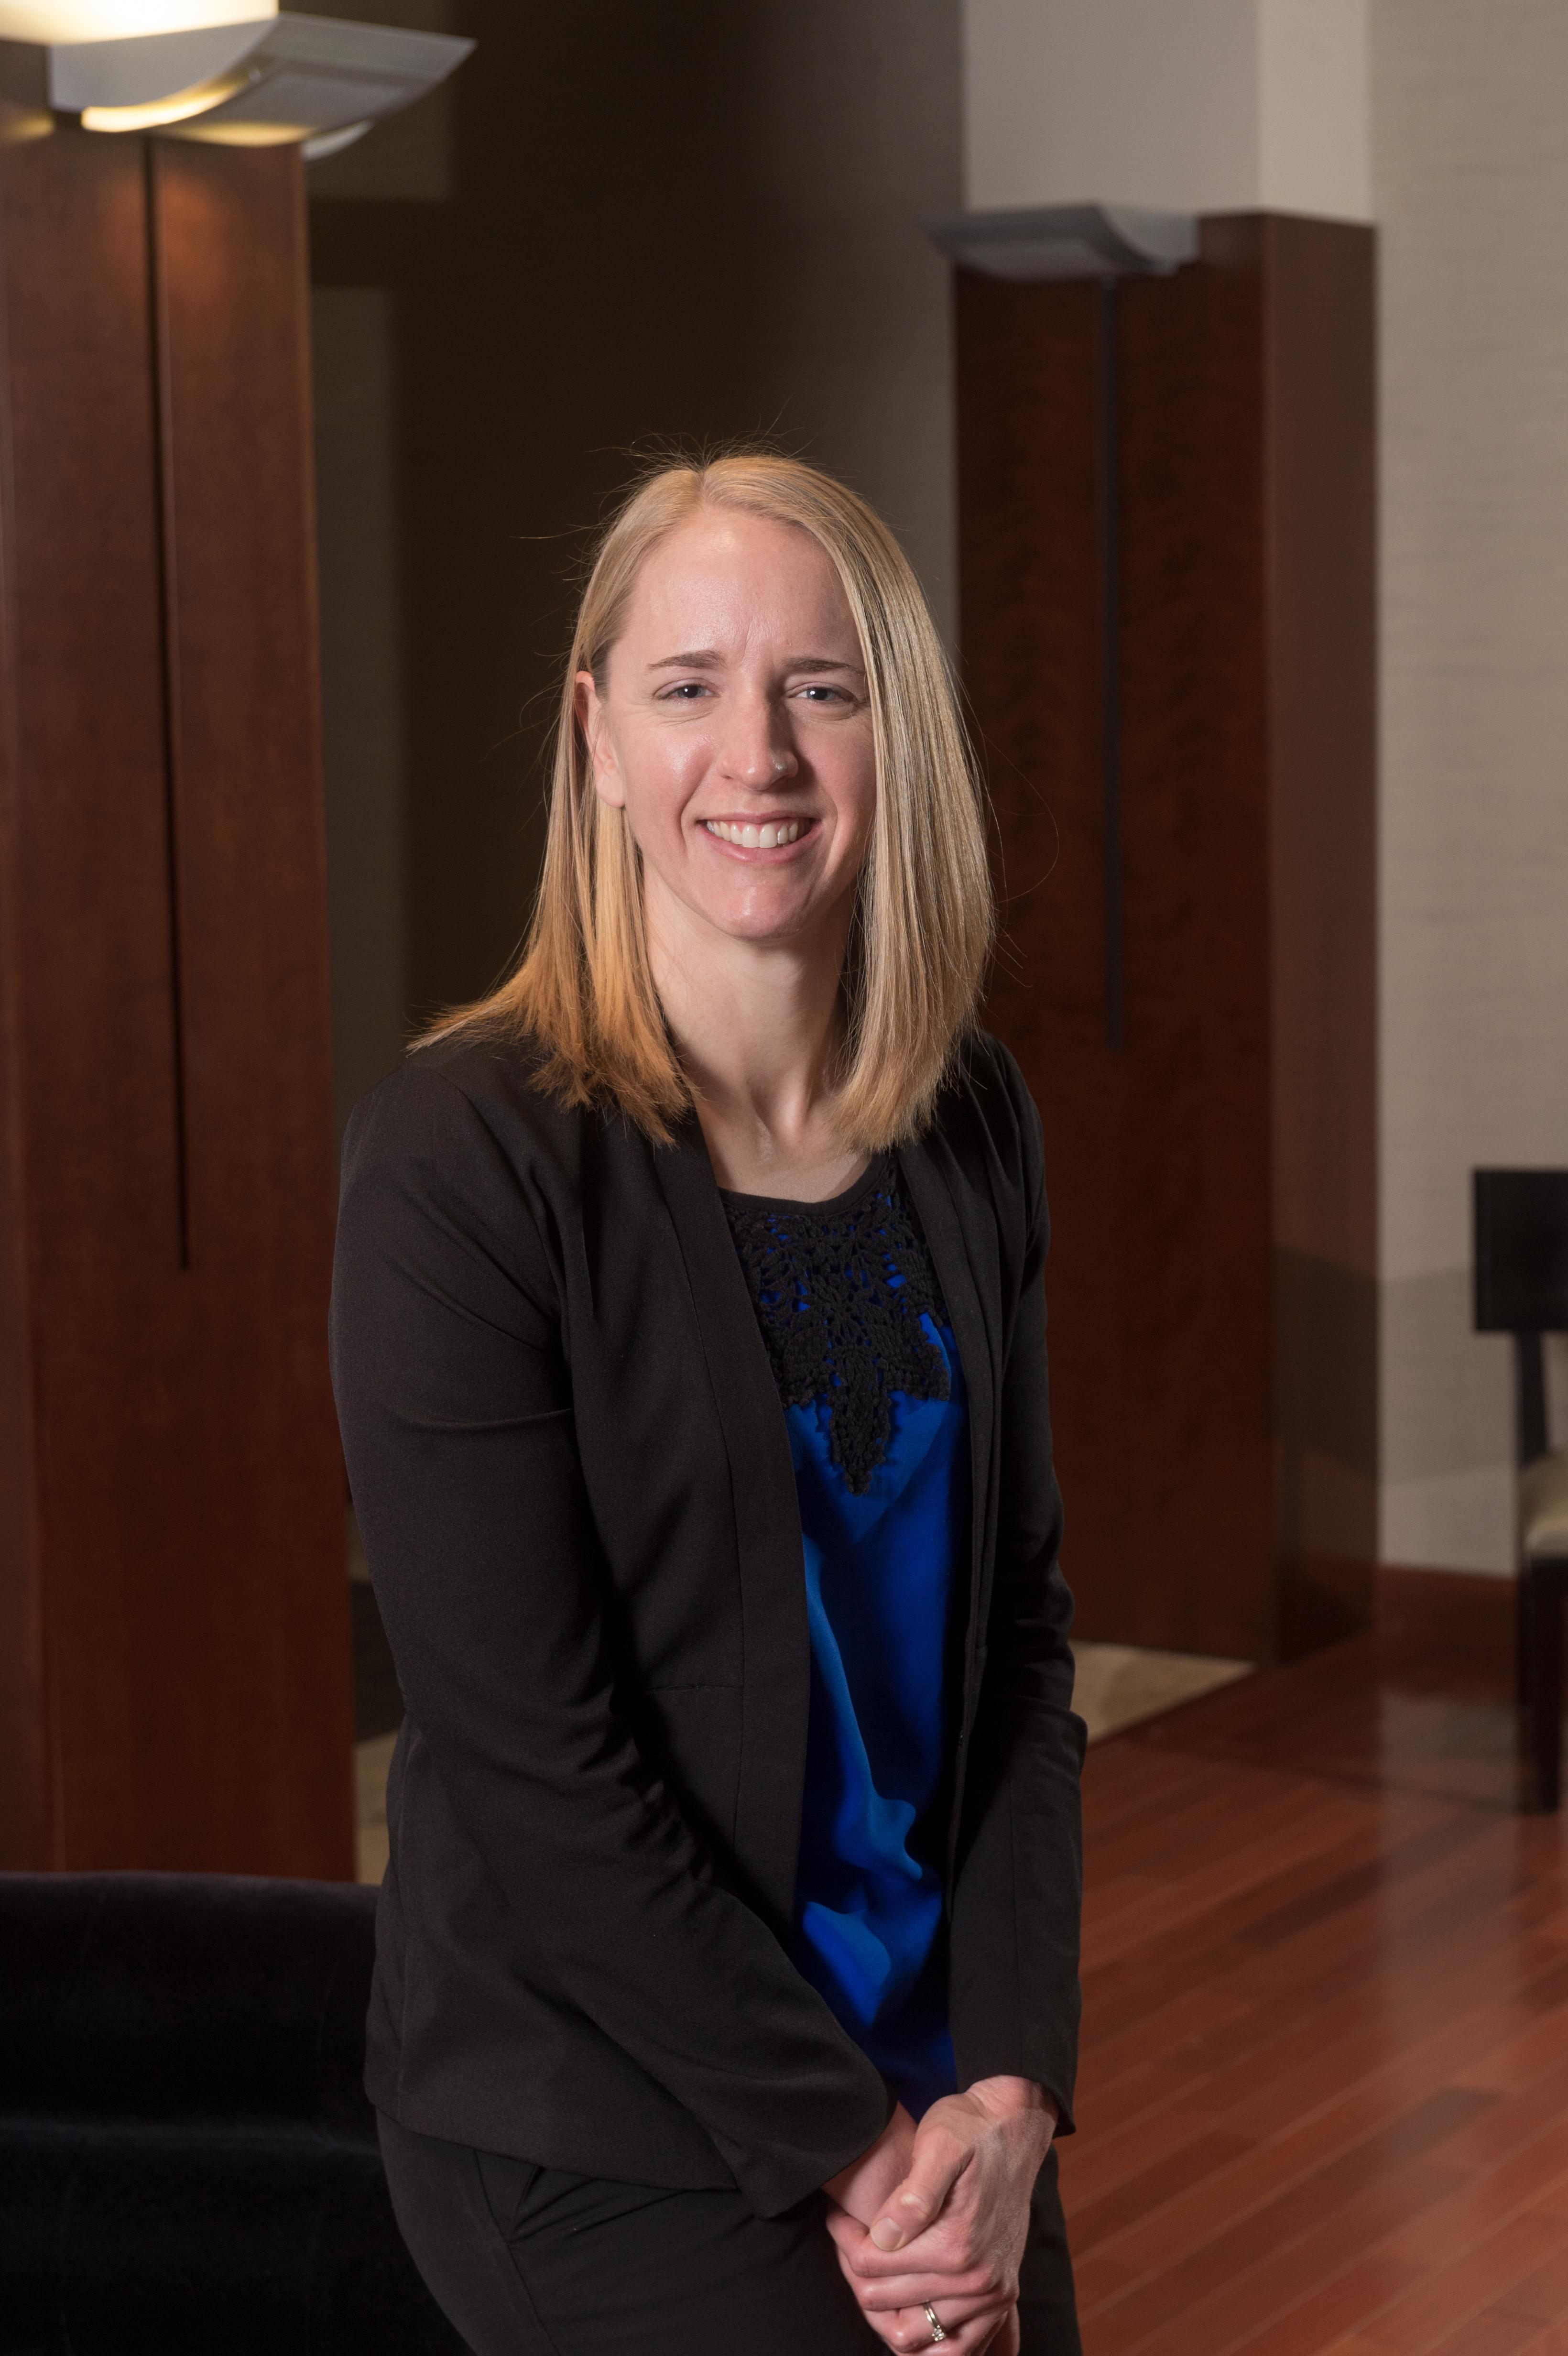 Jessica M. Lehmen, CPA